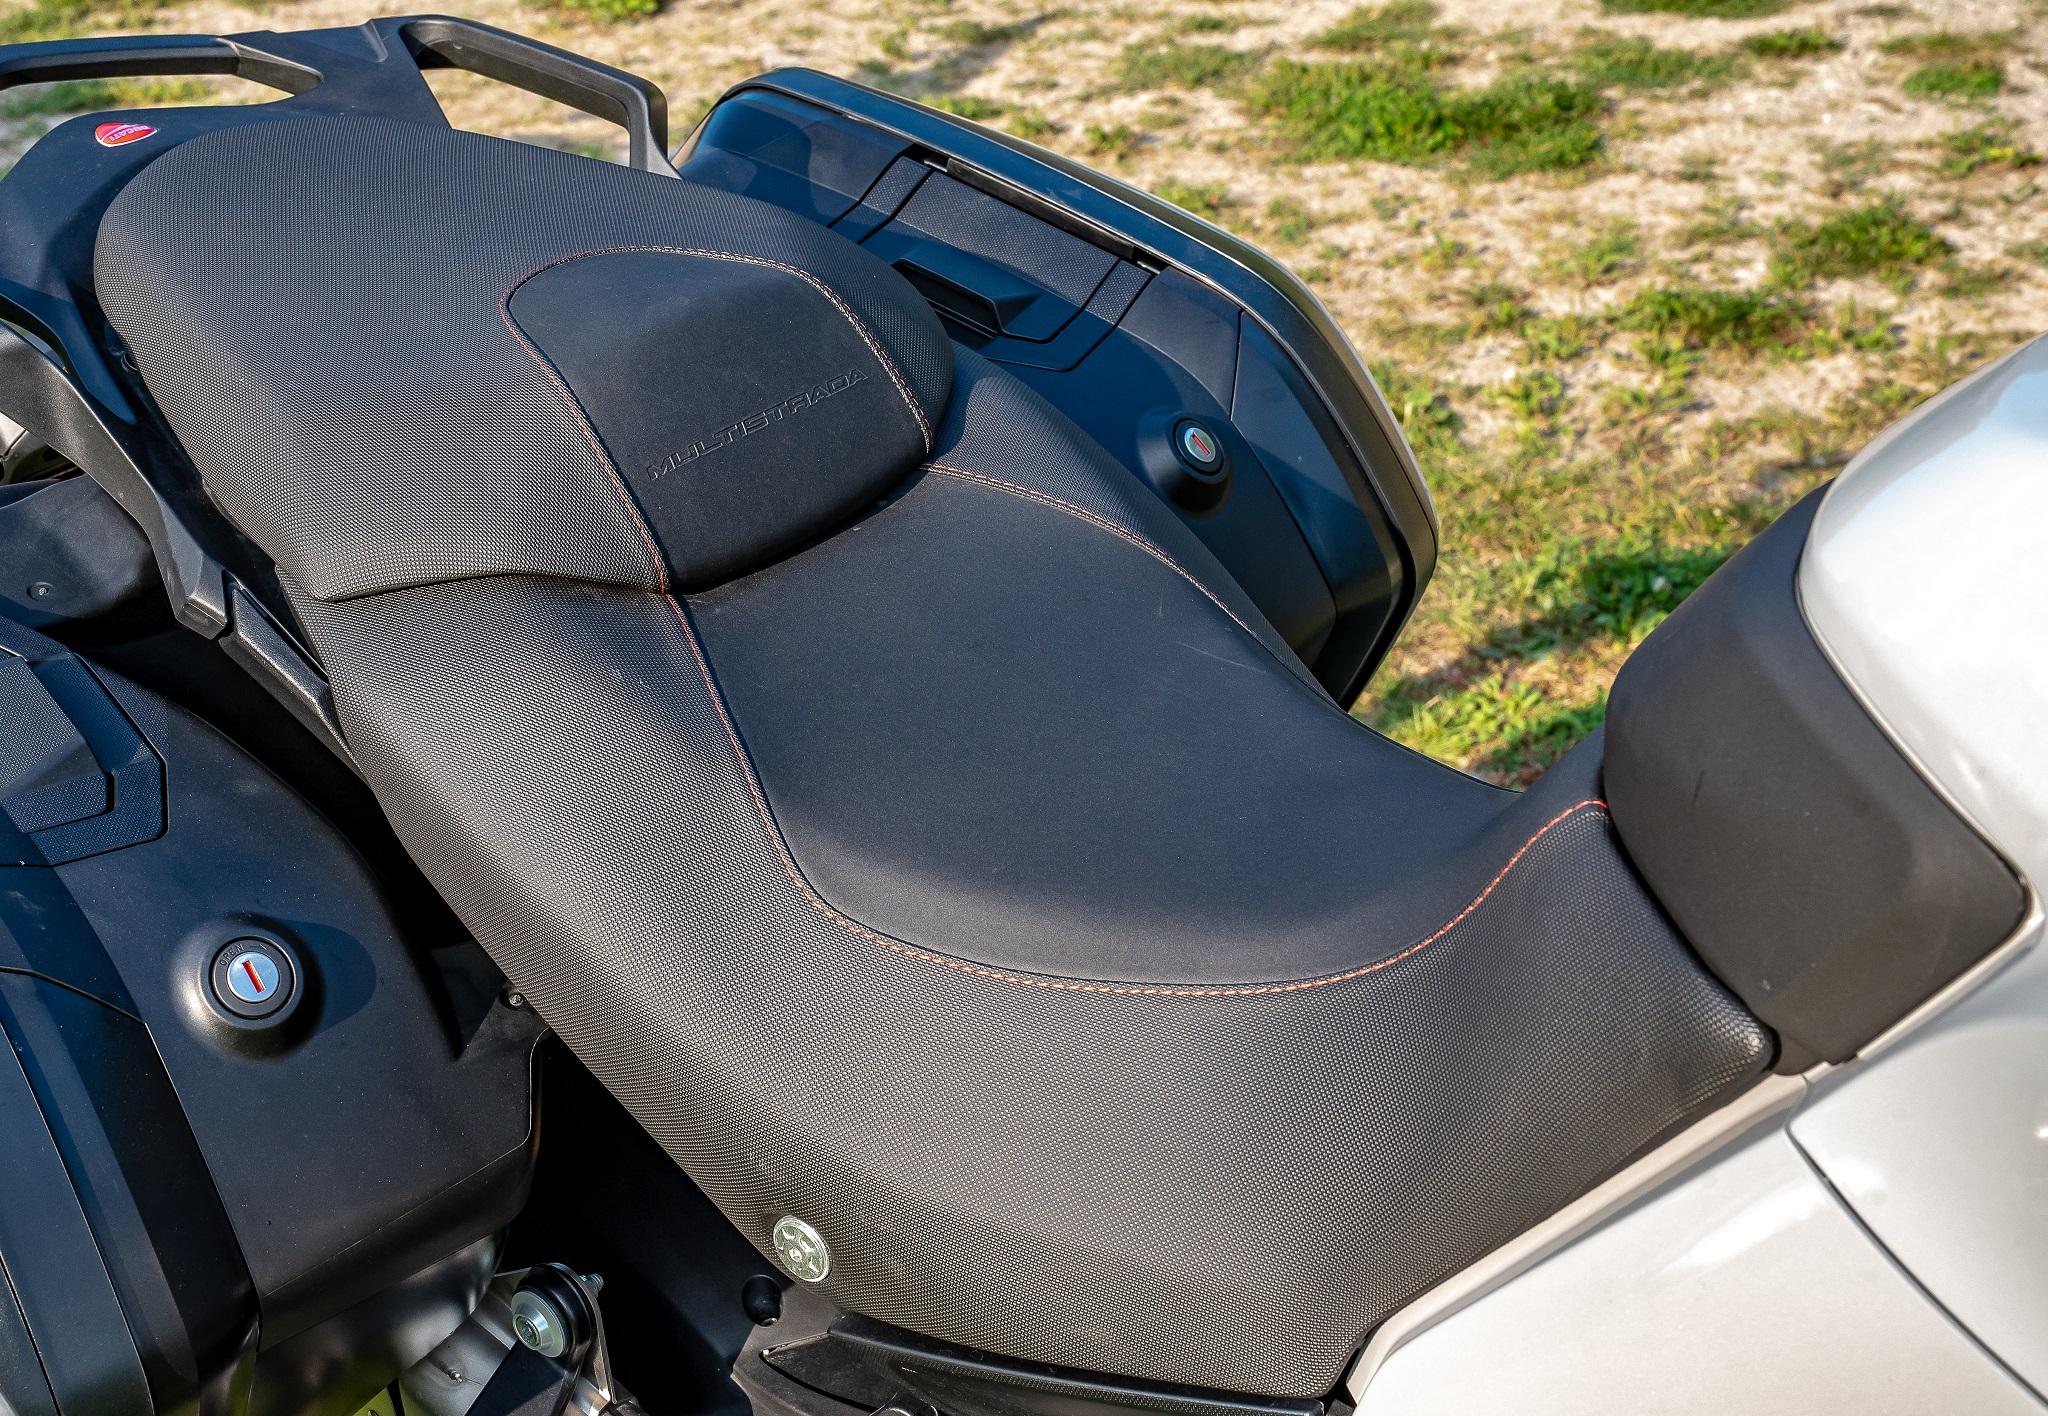 Comparatif Ducati Multistrada 960 S Kawasaki Versys 1000 SE Actumoto.ch (c) Mathias Deshusses